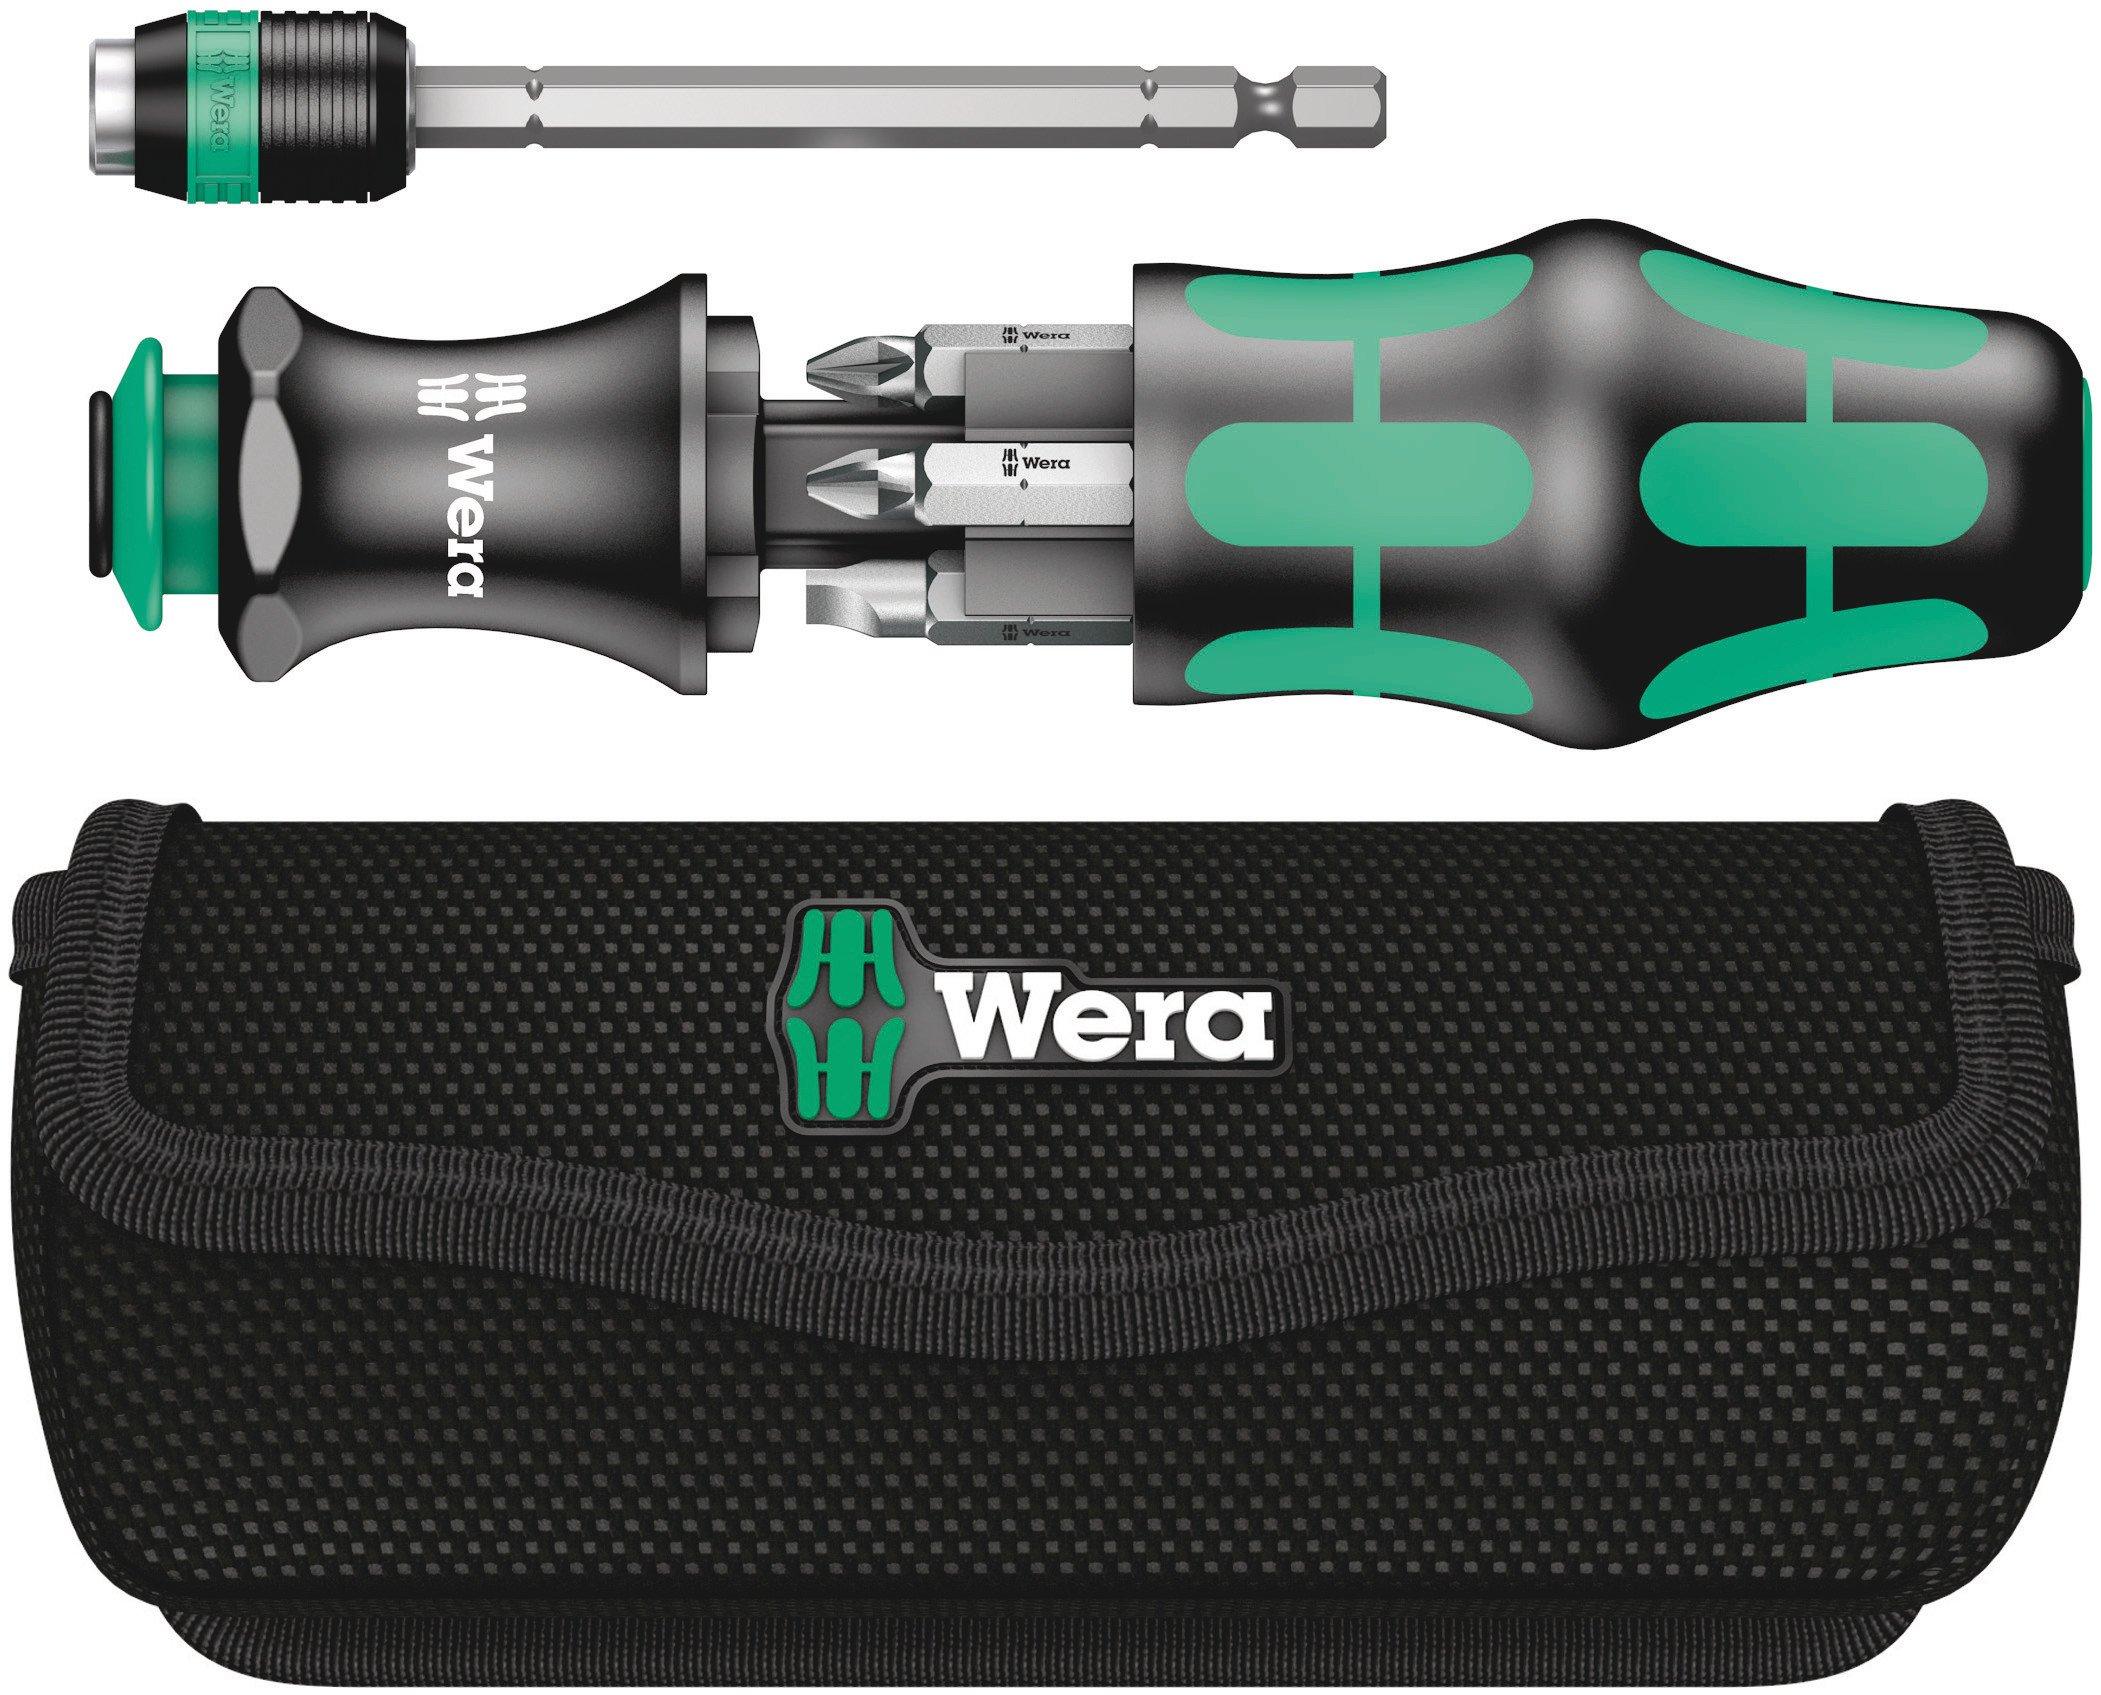 Wera Kraftform Kompact 20 7-In-1 Bitholding Screwdriver with Removable Bayonet Blade (SL/PH/PZ) by Wera